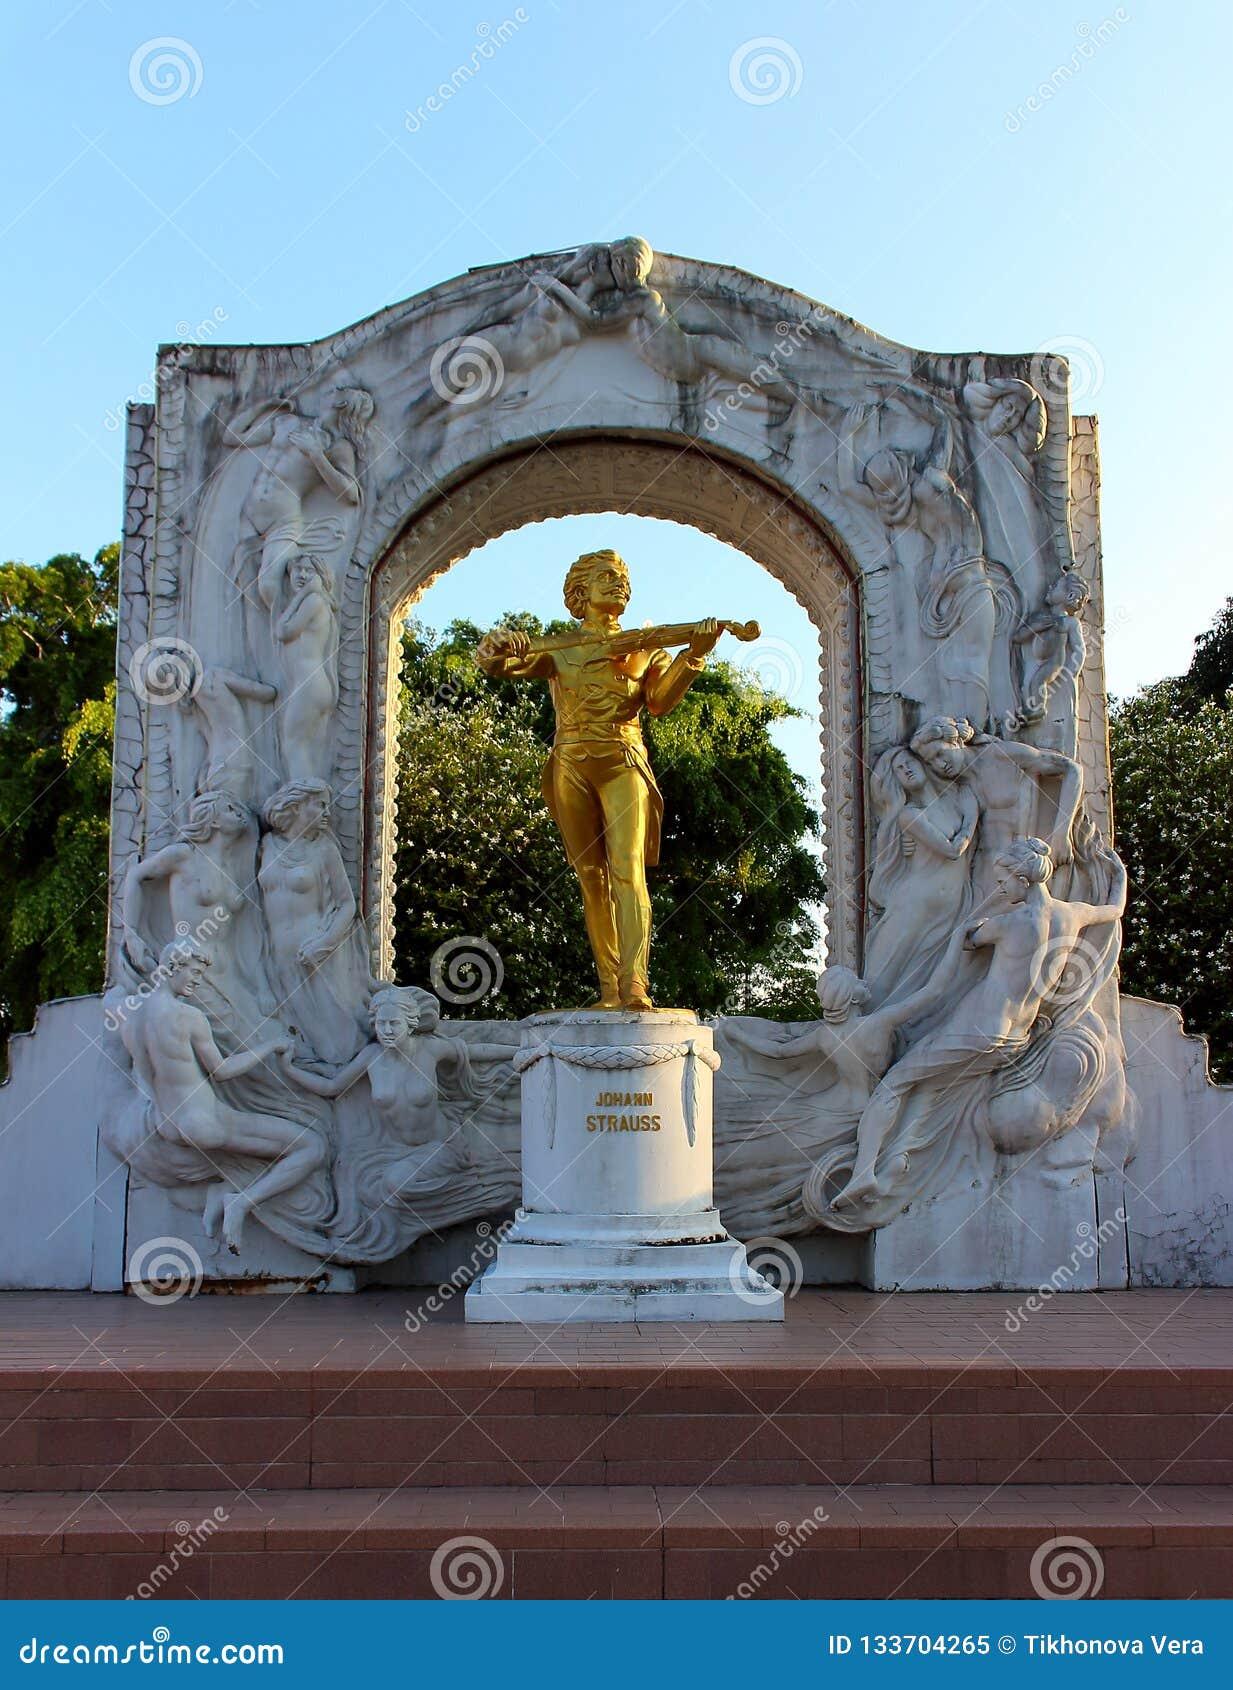 Replicastandbeeld van Johann Strauss